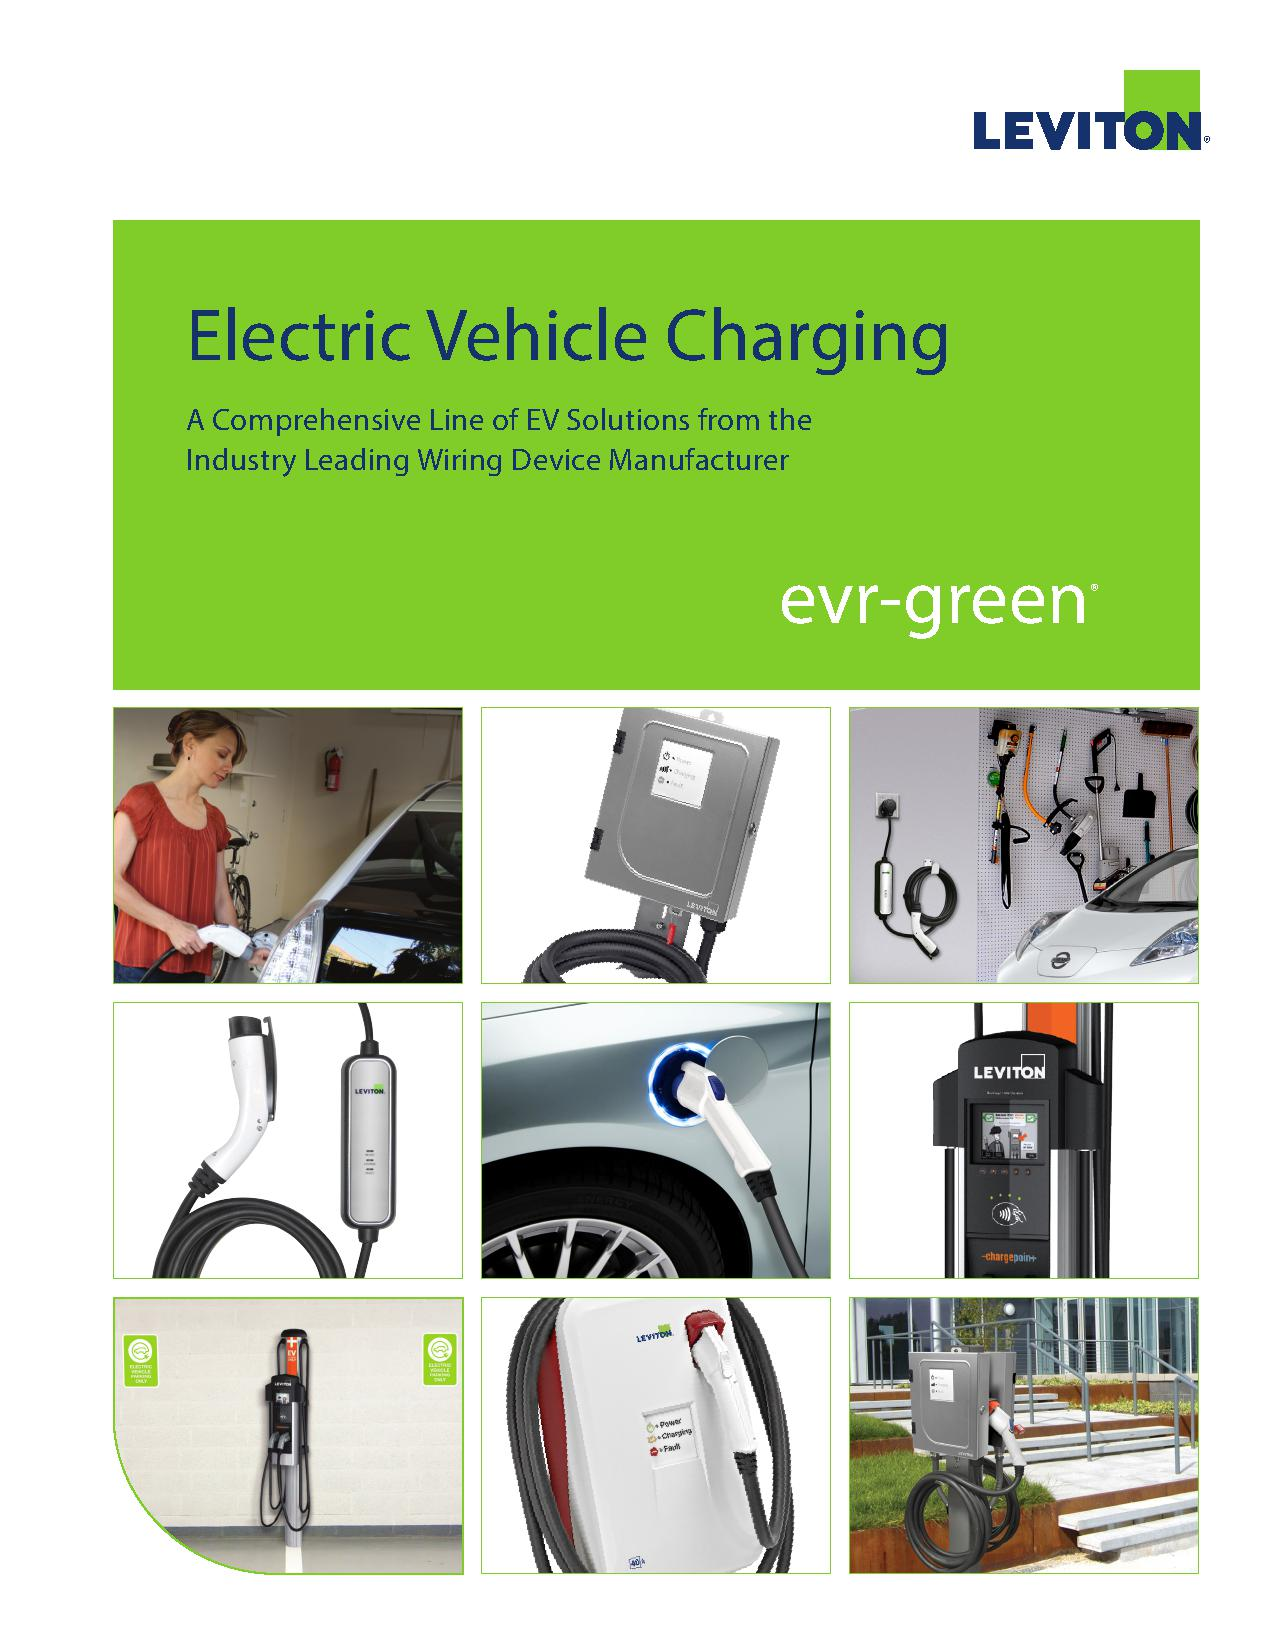 Leviton Electric Vehicle Charging Equipment Ajb Sales